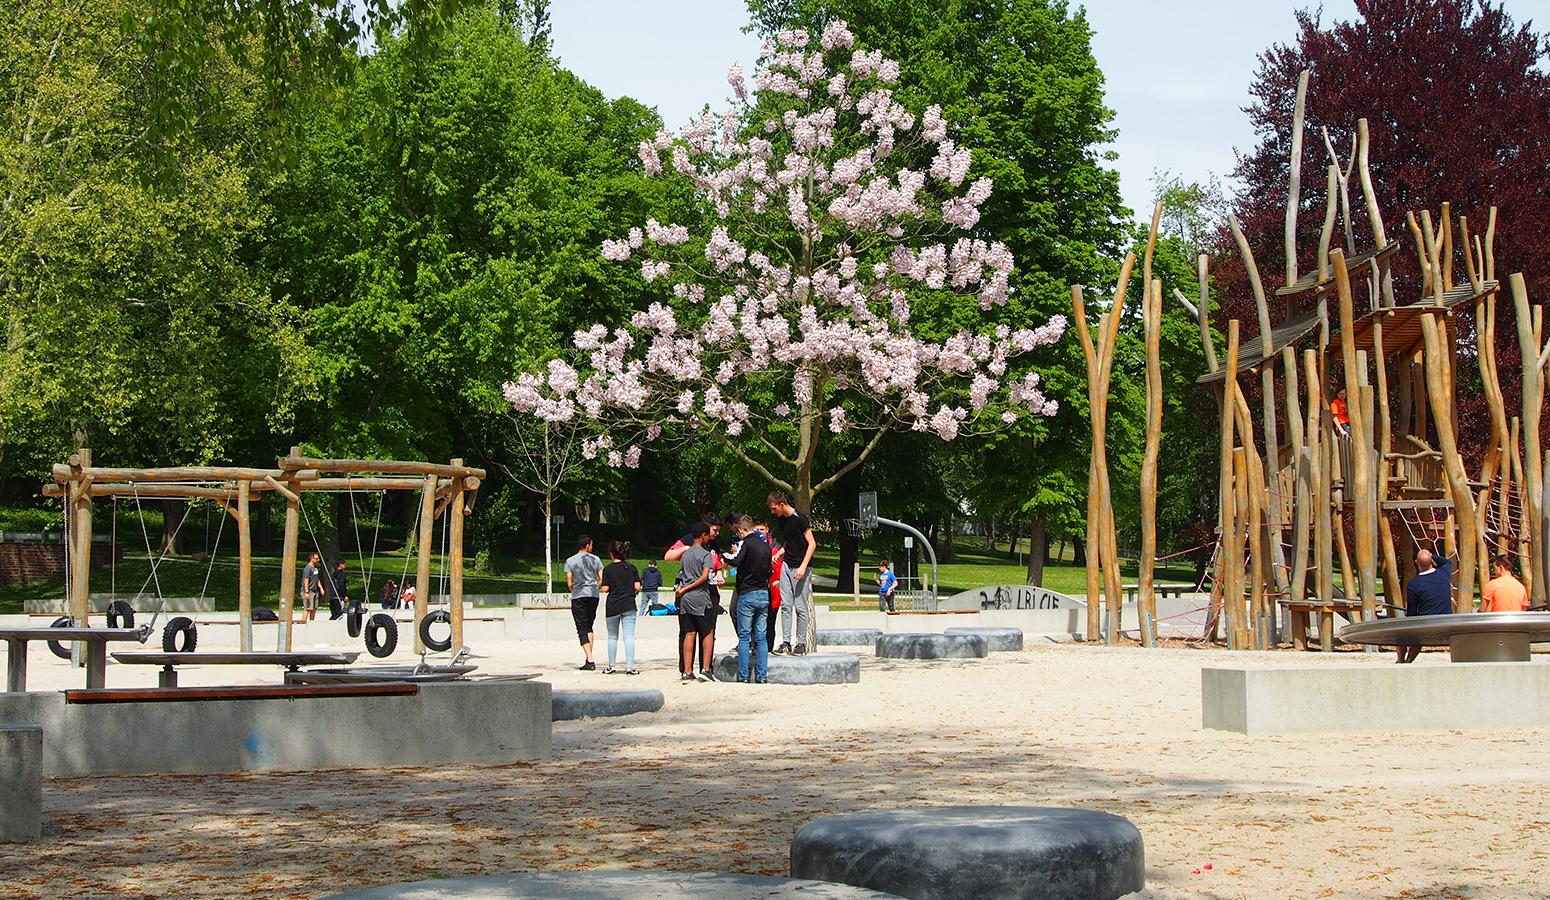 STrauma Landschaftsarchitektur Berlin landscape architects Höchster Stadtpark Frankfurt am Main